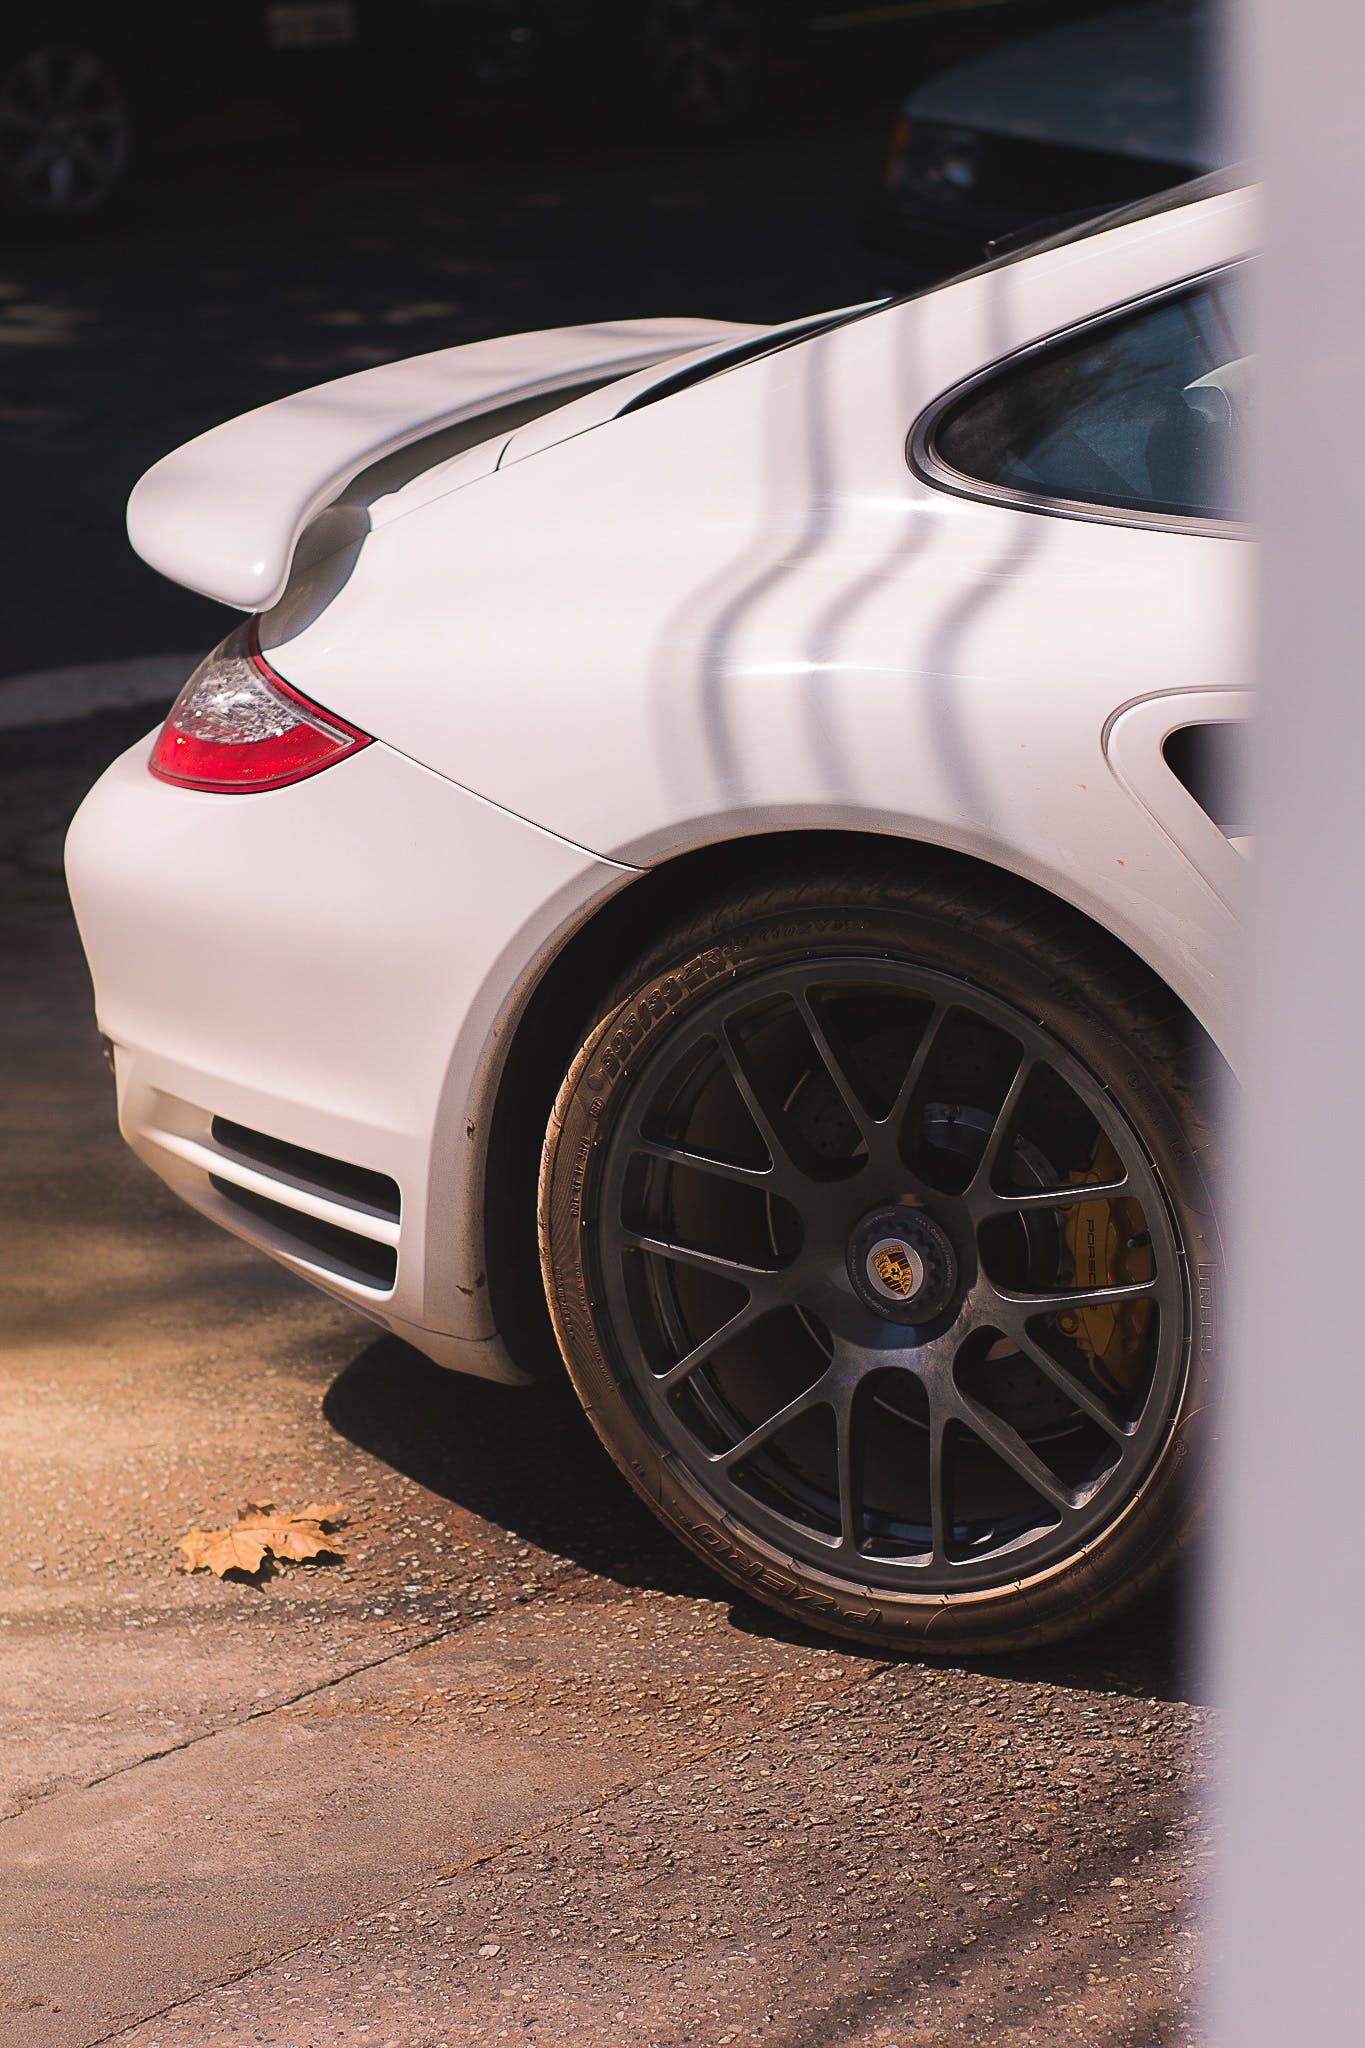 Free stock photo of automotive, big wheel, car, car wallpapers